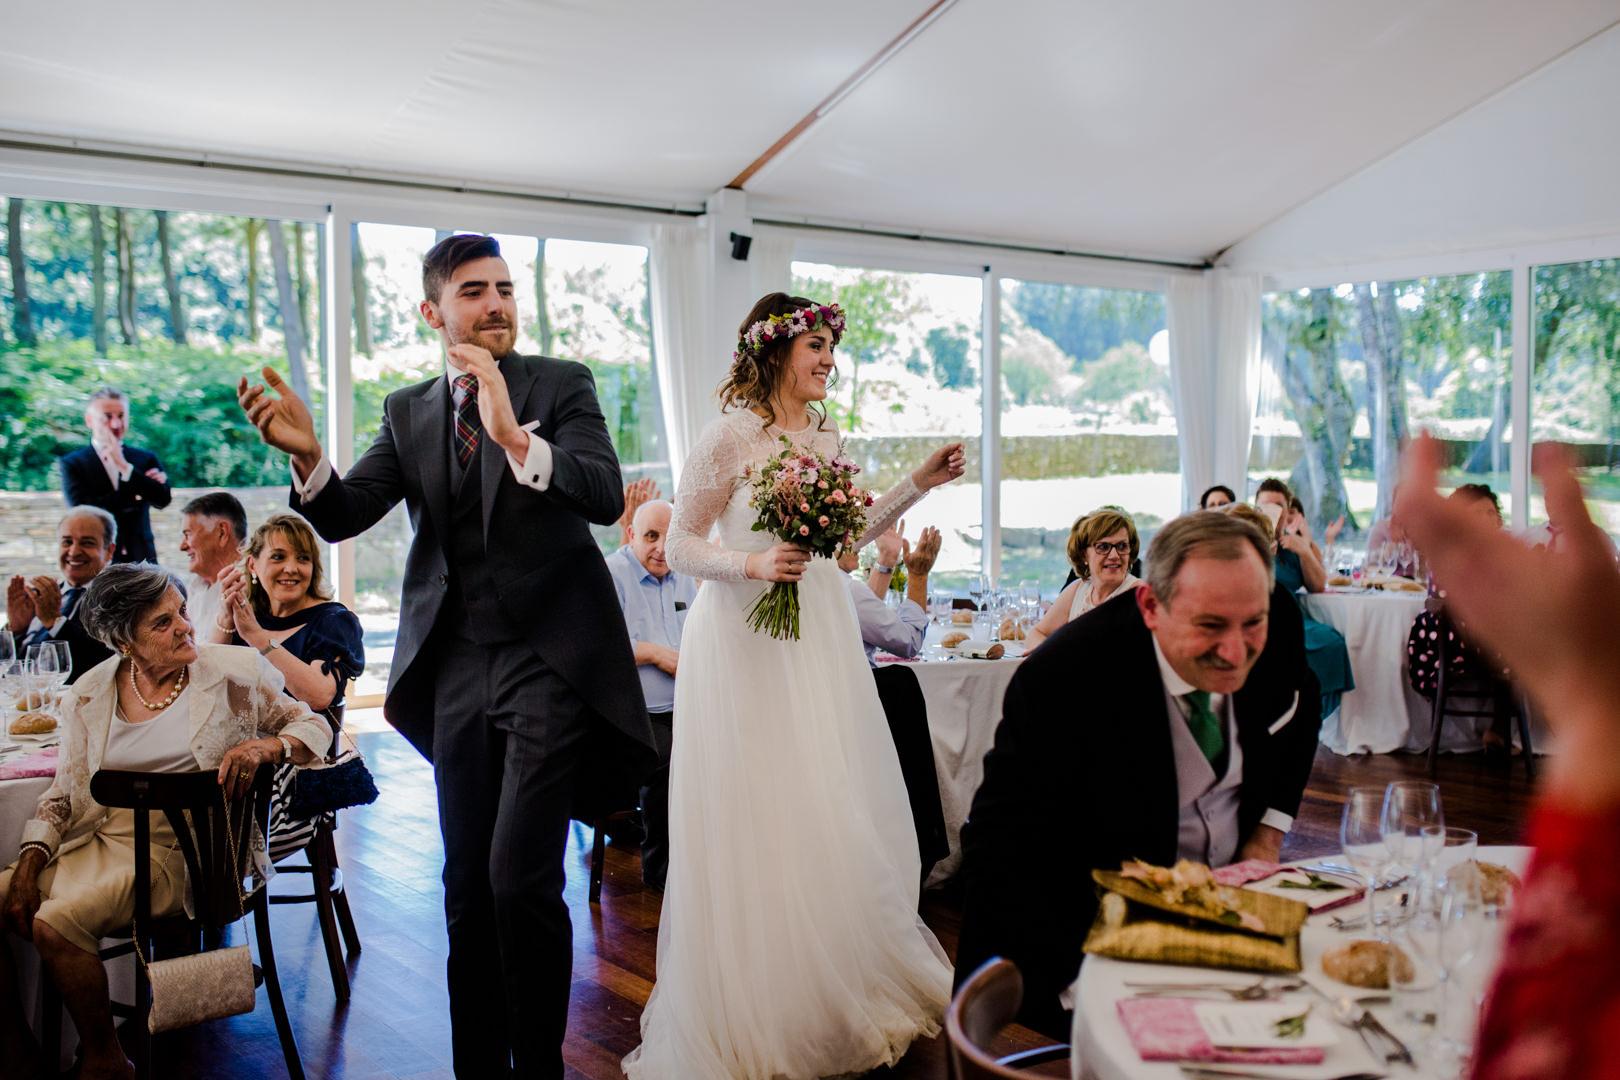 Boda-Lucia-Javi-Lugo-Rafael-Torres-fotografo-bodas-sevilla-madrid-barcelona-wedding-photographer--34.jpg